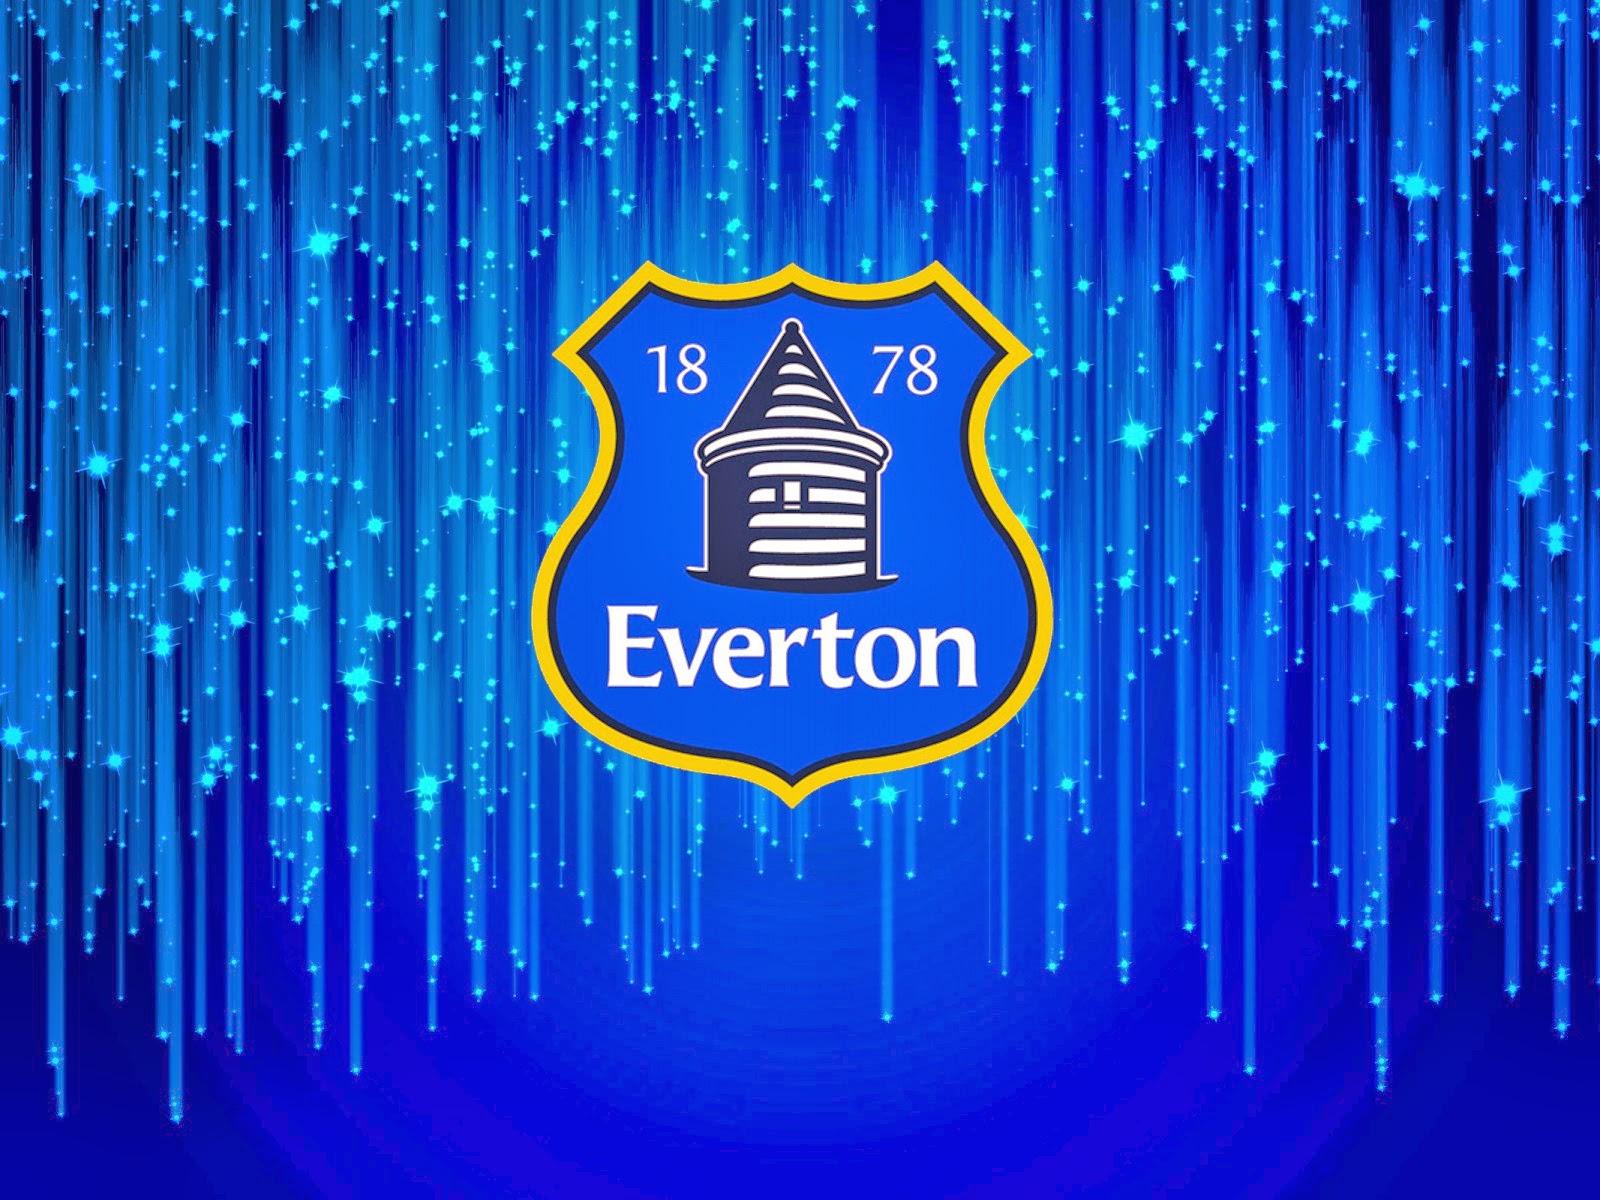 Emirates Wallpaper Hd Everton Backgrounds Download Free Pixelstalk Net